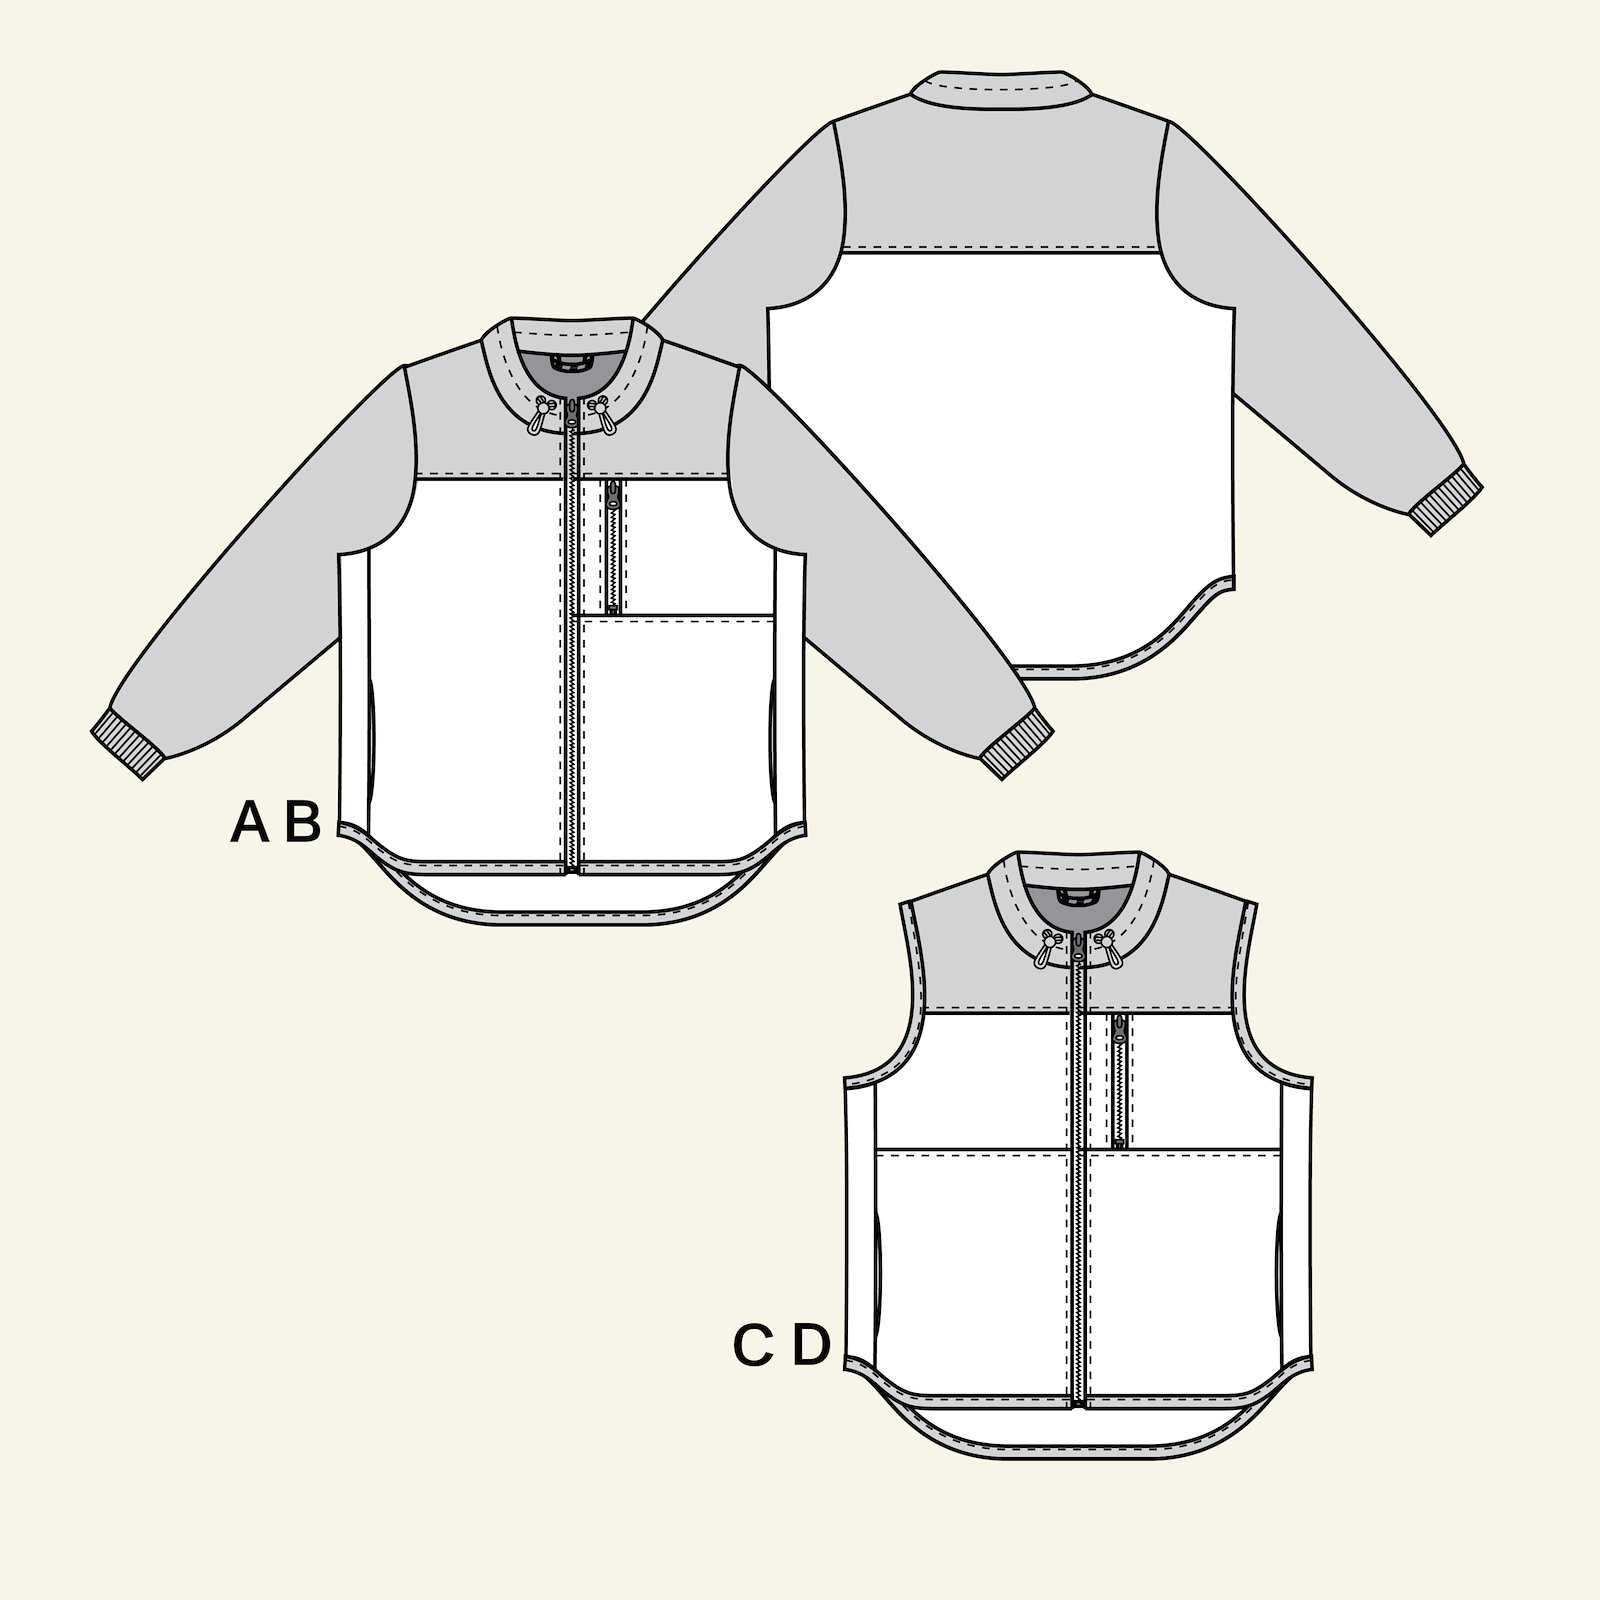 Jacket and waistcoat, 40/12 p24049_pack